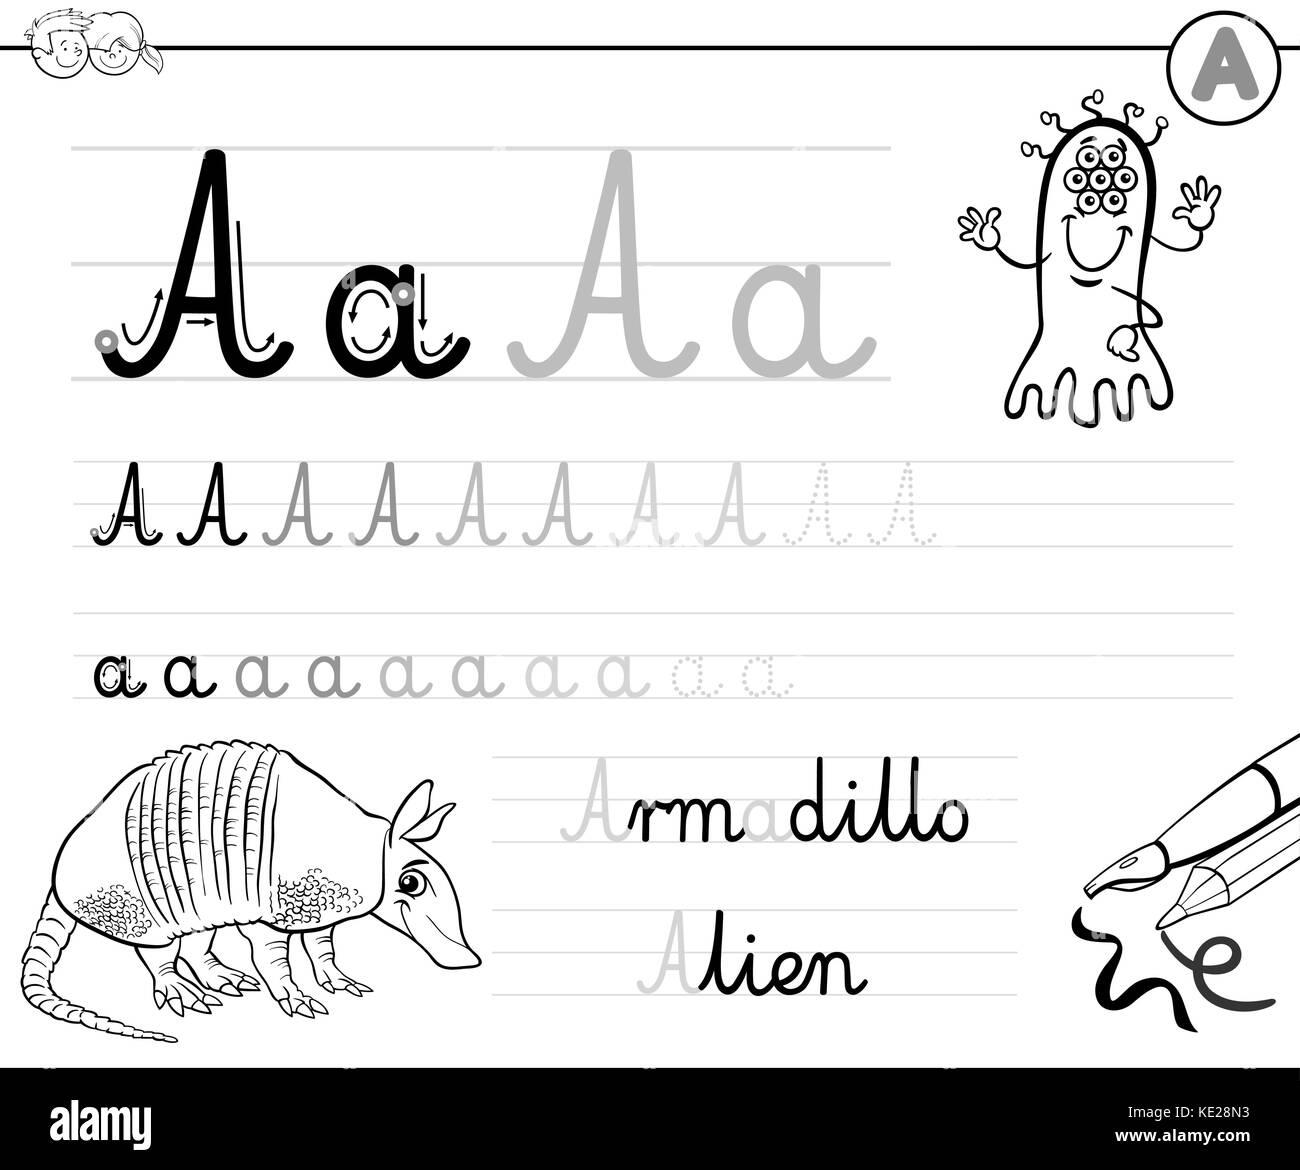 Cartoon Illustration Writing Skills Practice Stockfotos & Cartoon ...